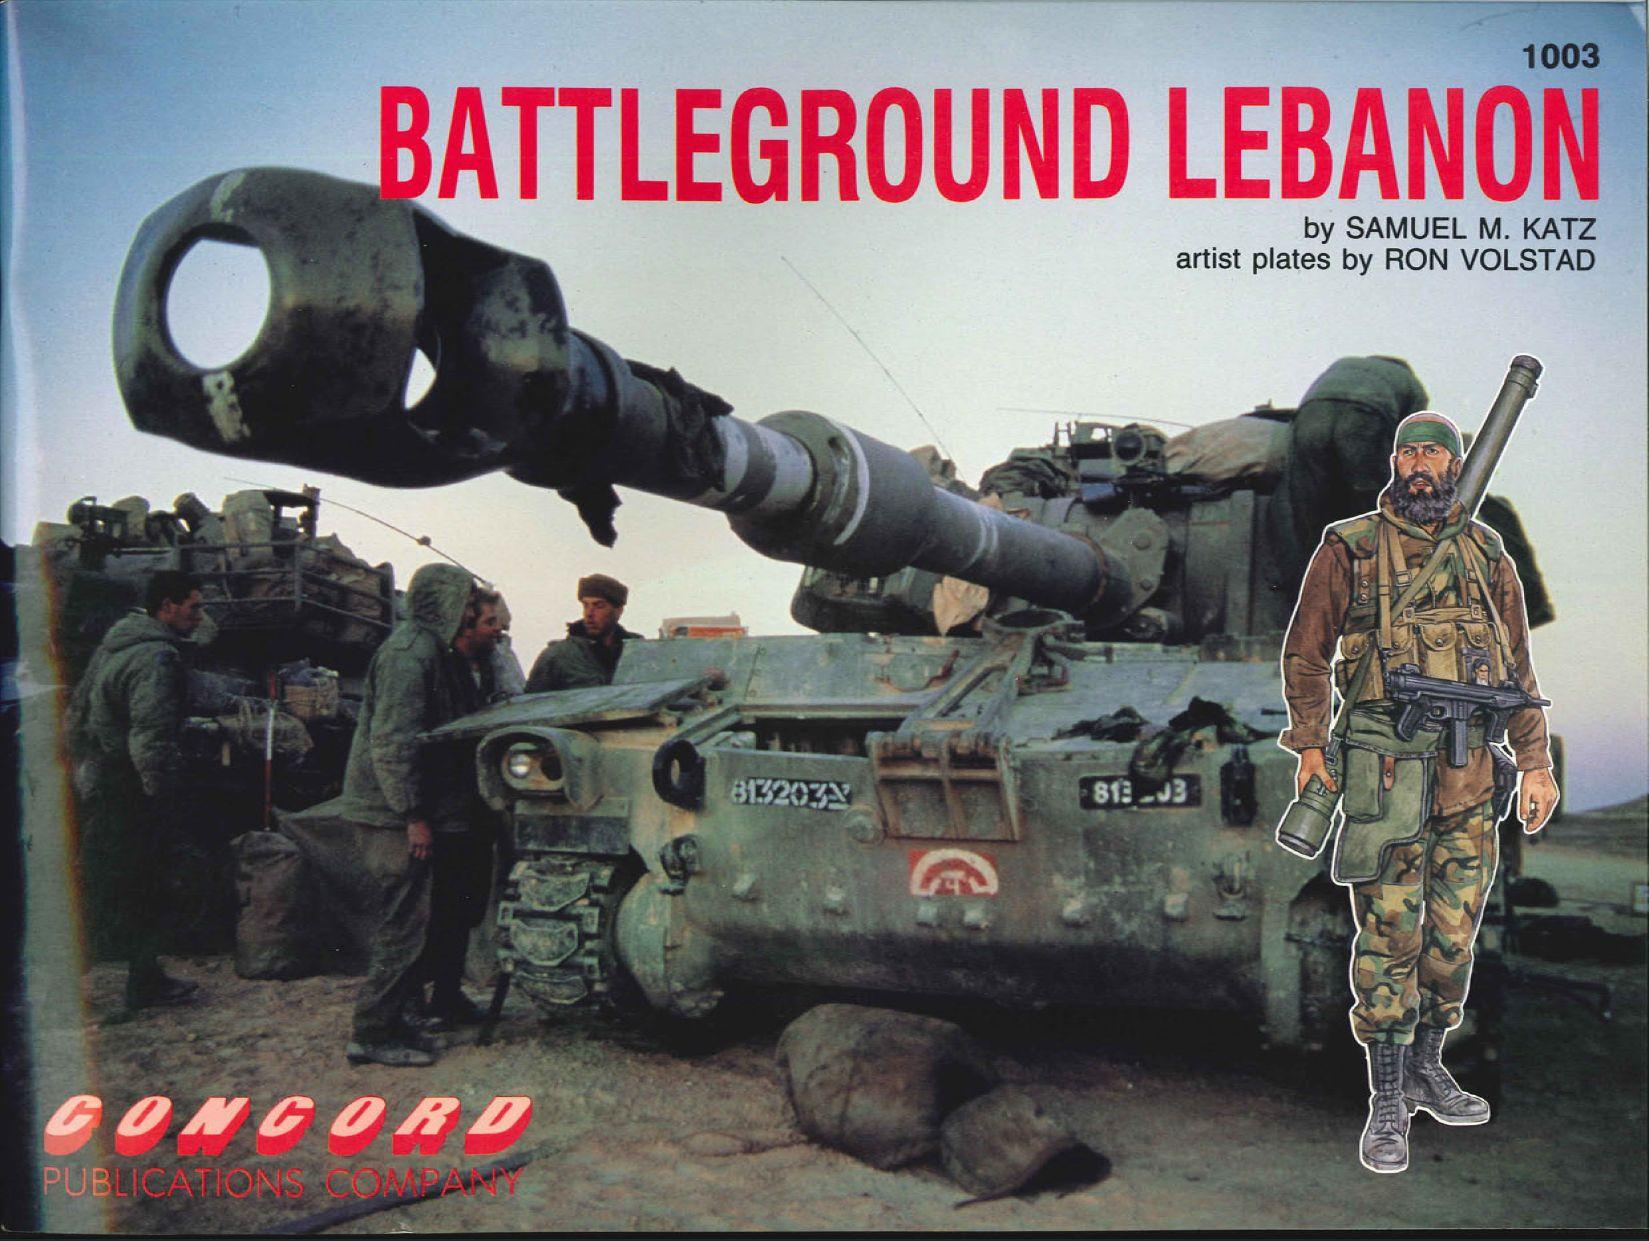 Concord. 1003 Battleground Lebanon (1).jpg